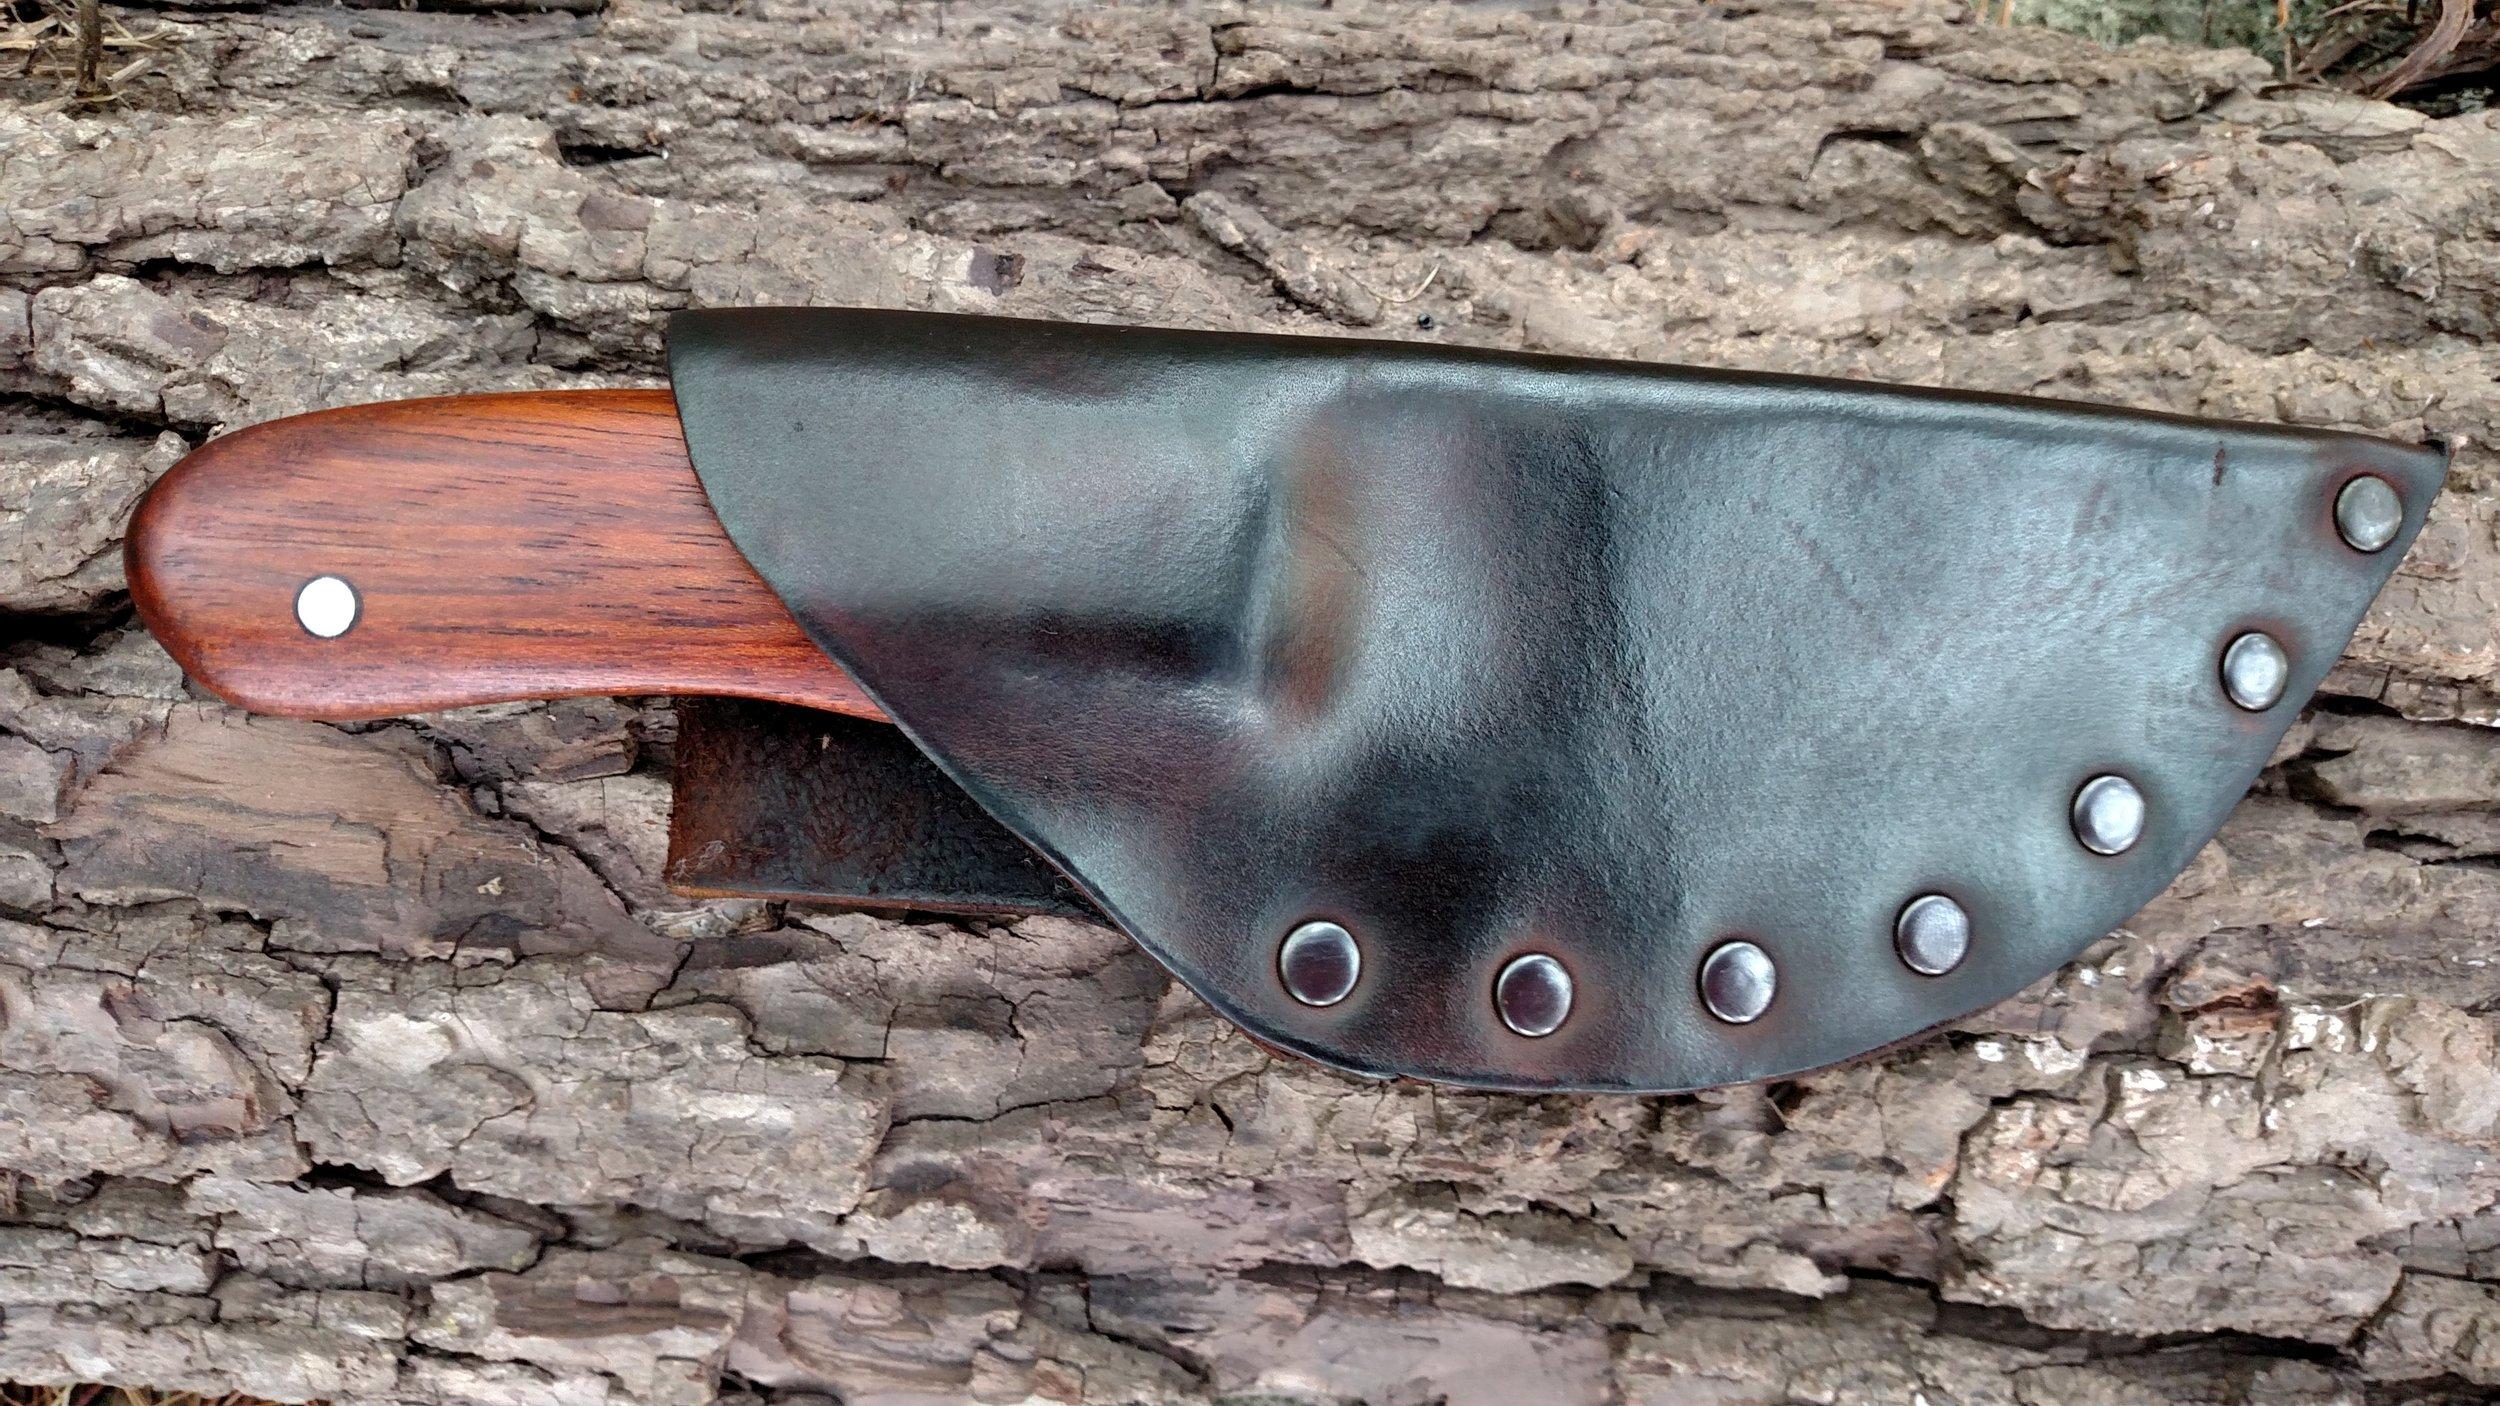 Boot Knife in Sheath